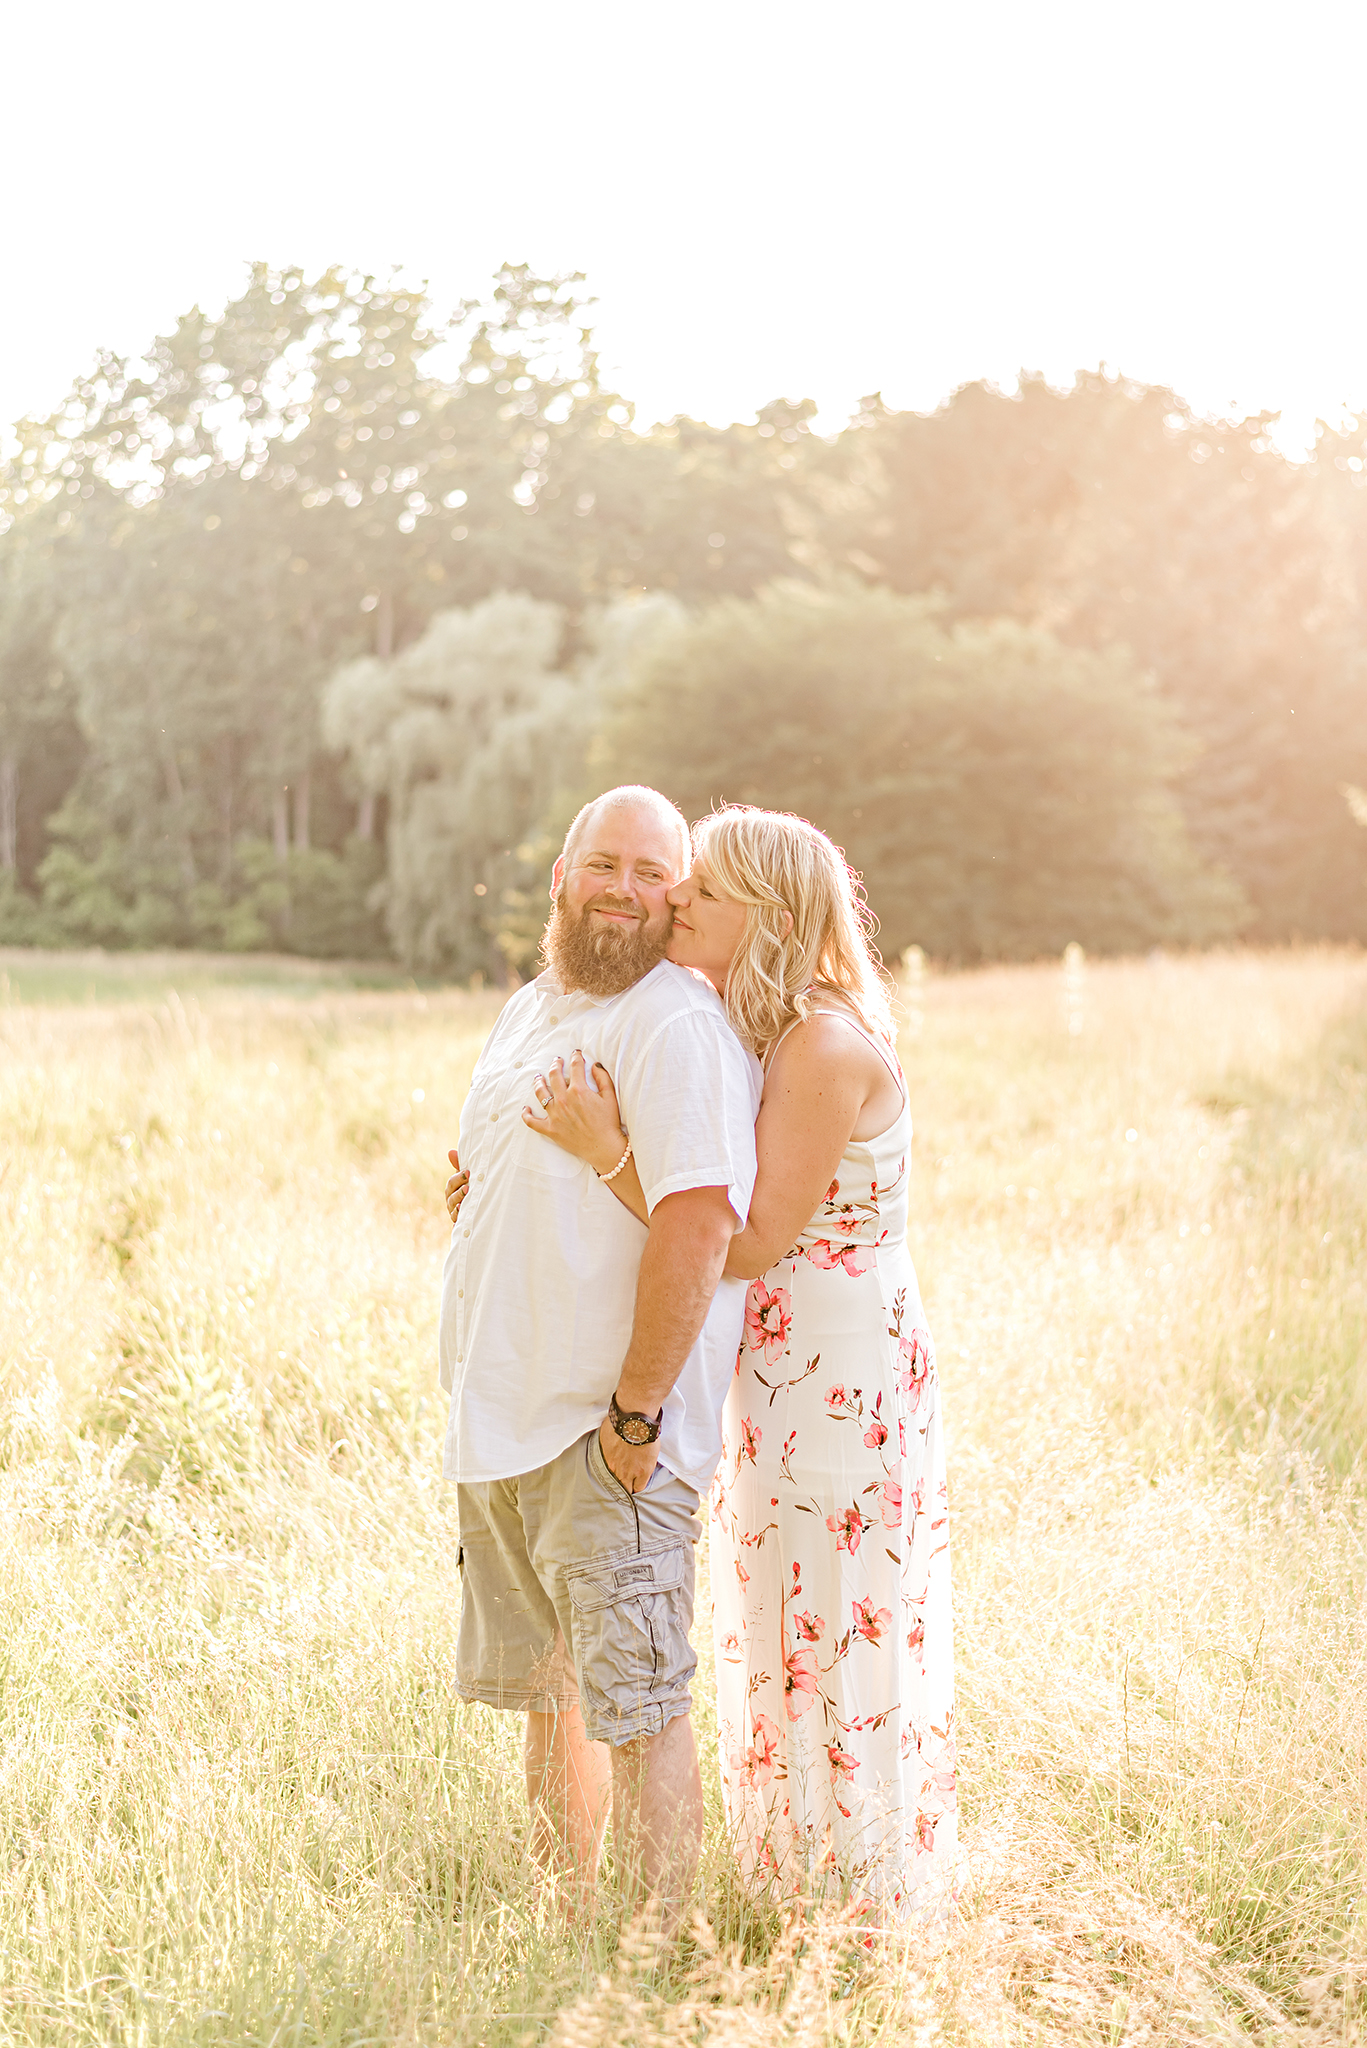 Lindsay-Adkins-Photography-Michigan-Engagement-And-Wedding-Photographer11